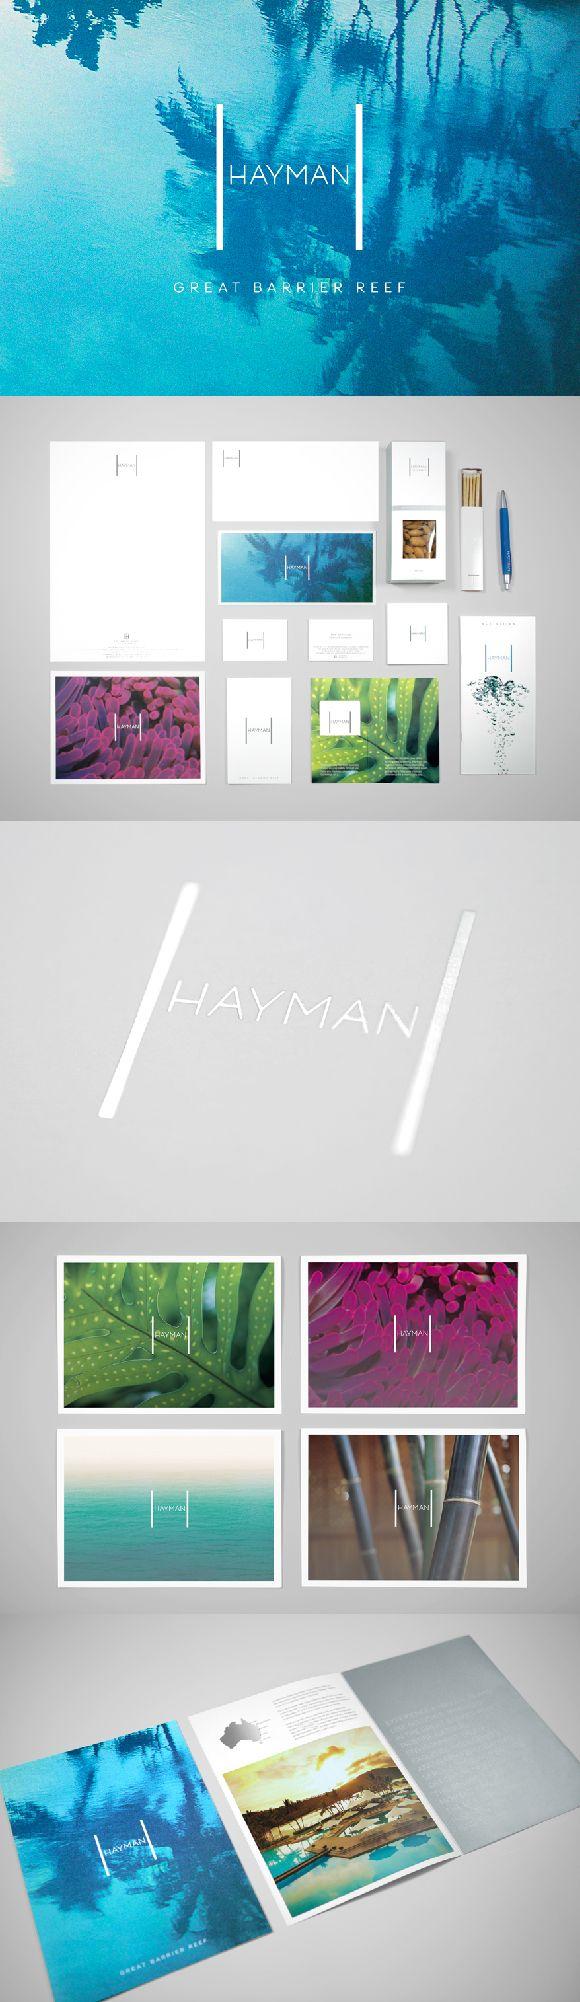 Hayman Island by FutureBrand